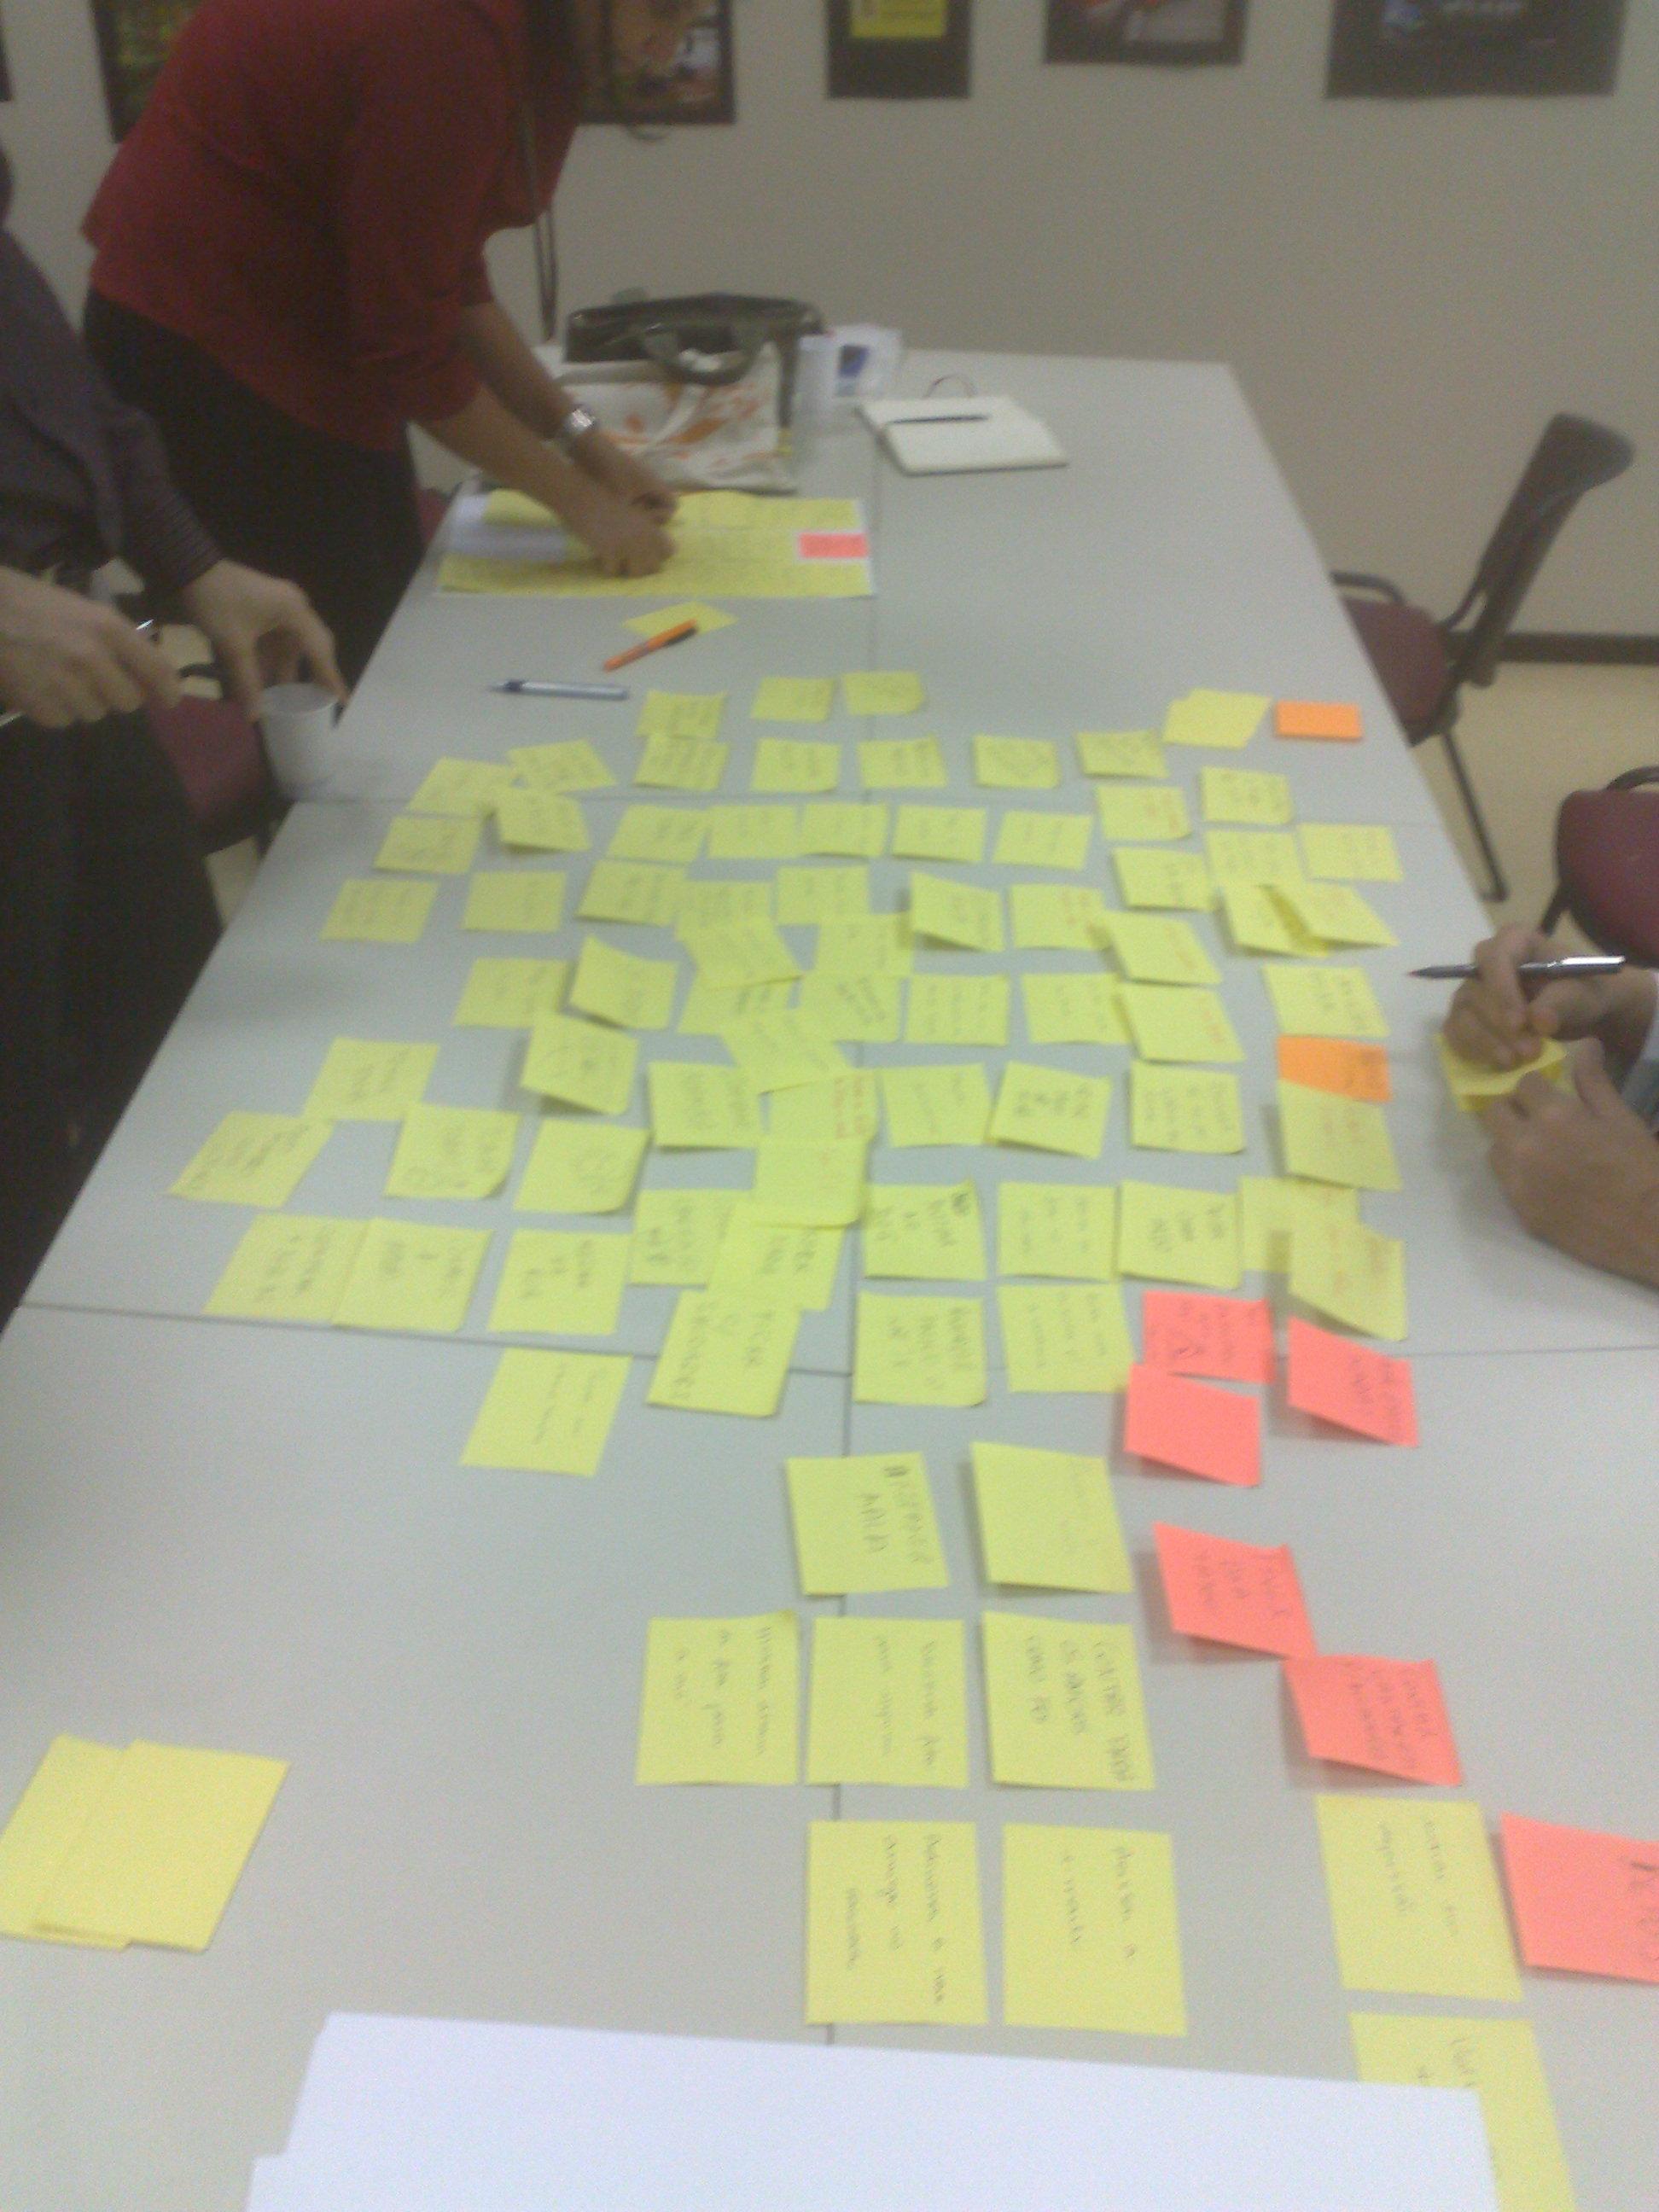 Day 7 - #DesignThinking and #Innovation - #SocialInnovation @dtespm w/@LuisAlt @TennyDesign